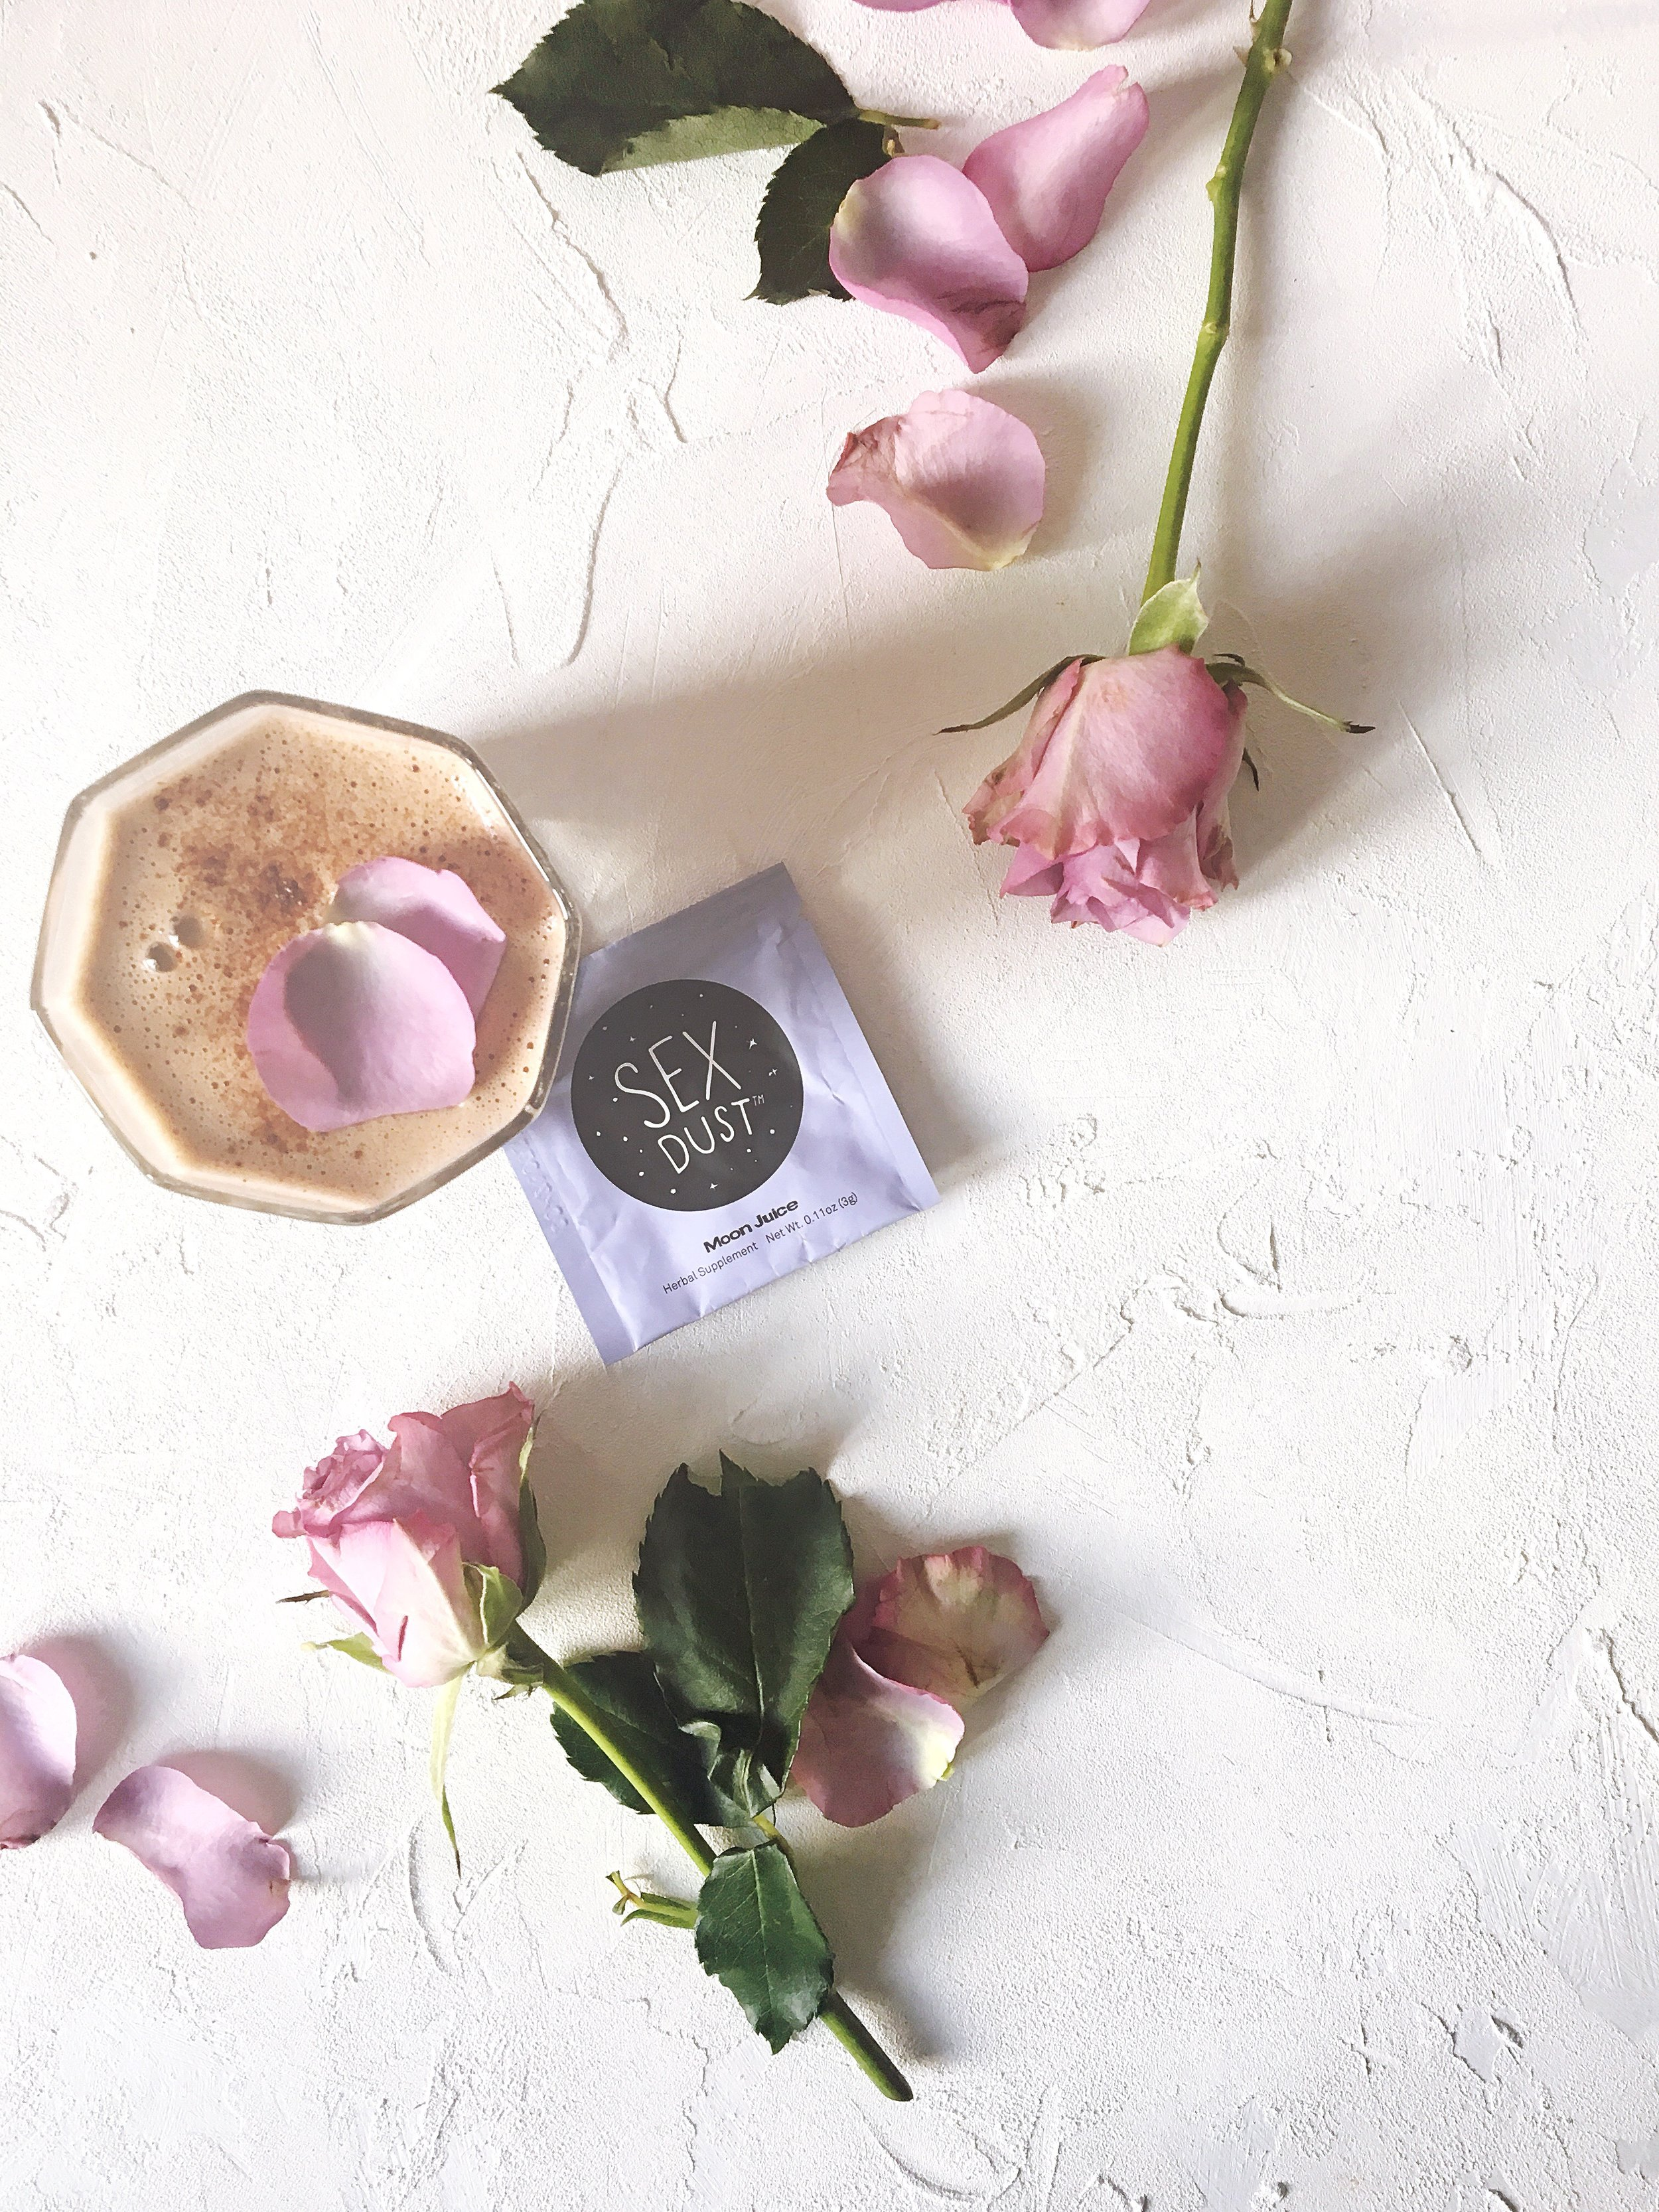 enchanted-by-sunlight-cacao-elixir-rose-moonjuice.jpg